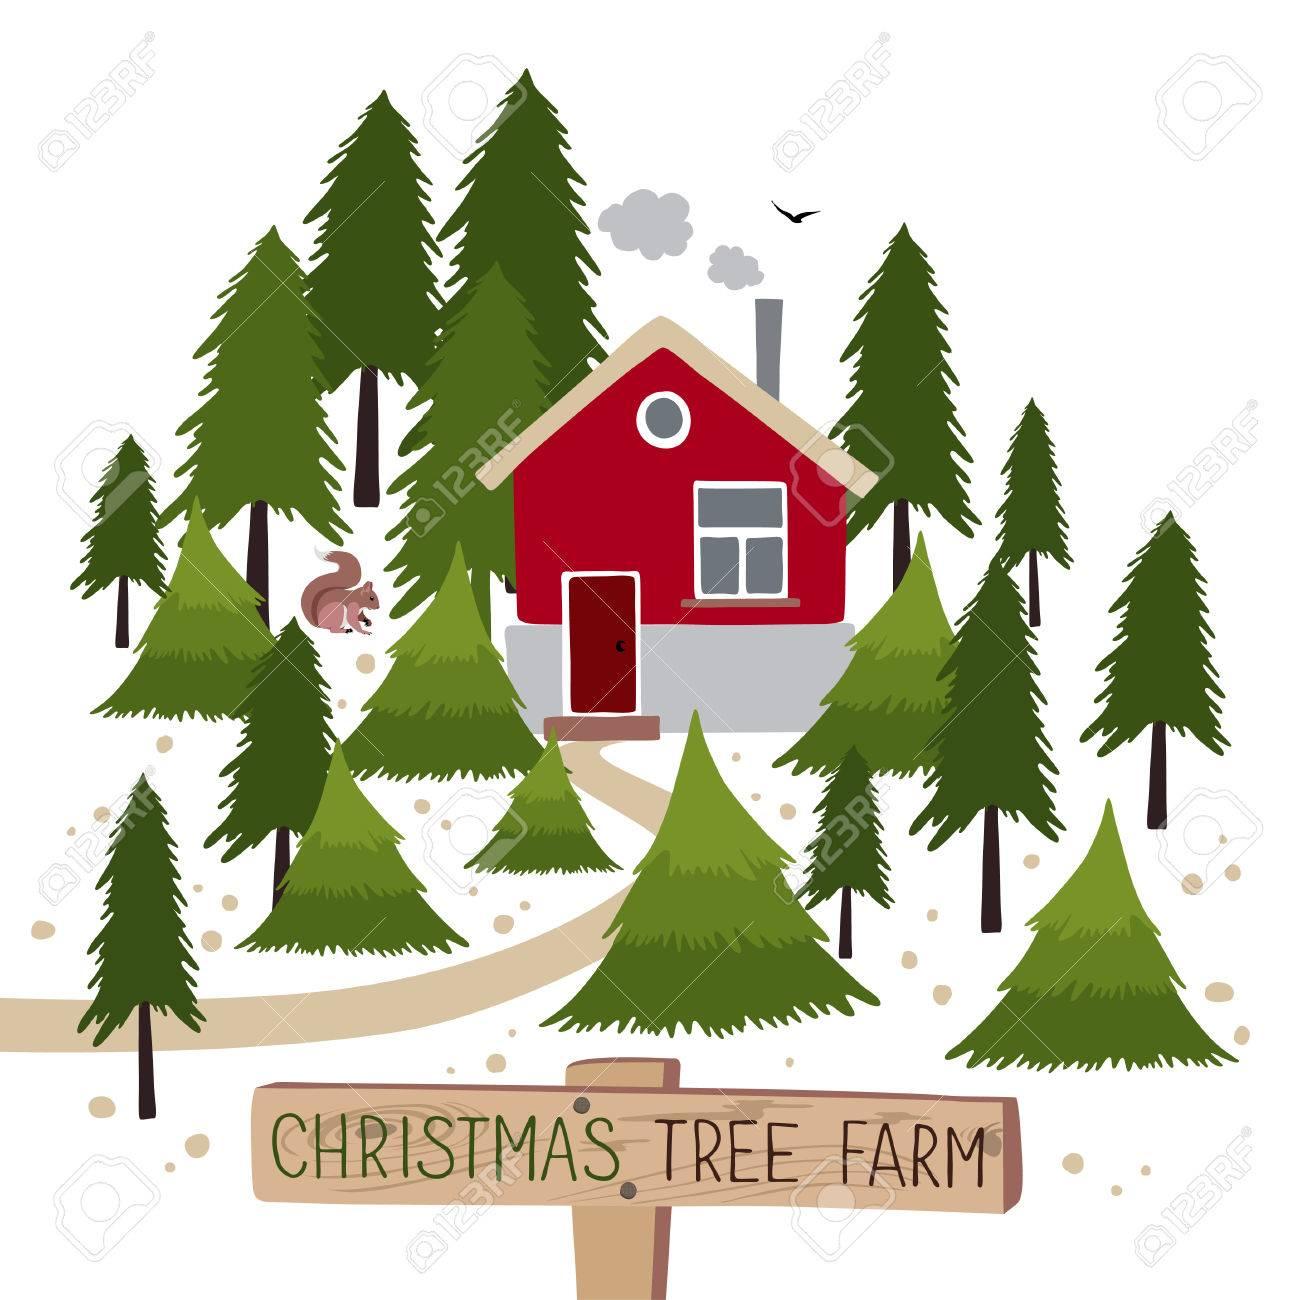 Christmas tree farm. Christmas Trees for sale.